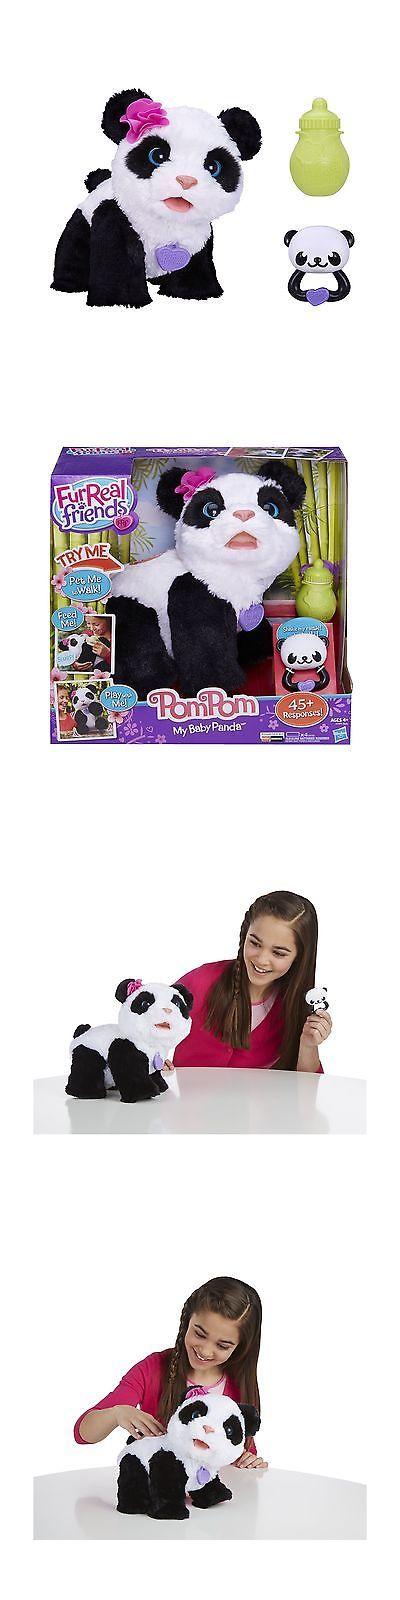 FurReal Friends 38288: Furreal Friends Pom Pom My Baby Panda Pet Standard Packaging -> BUY IT NOW ONLY: $68.77 on eBay!